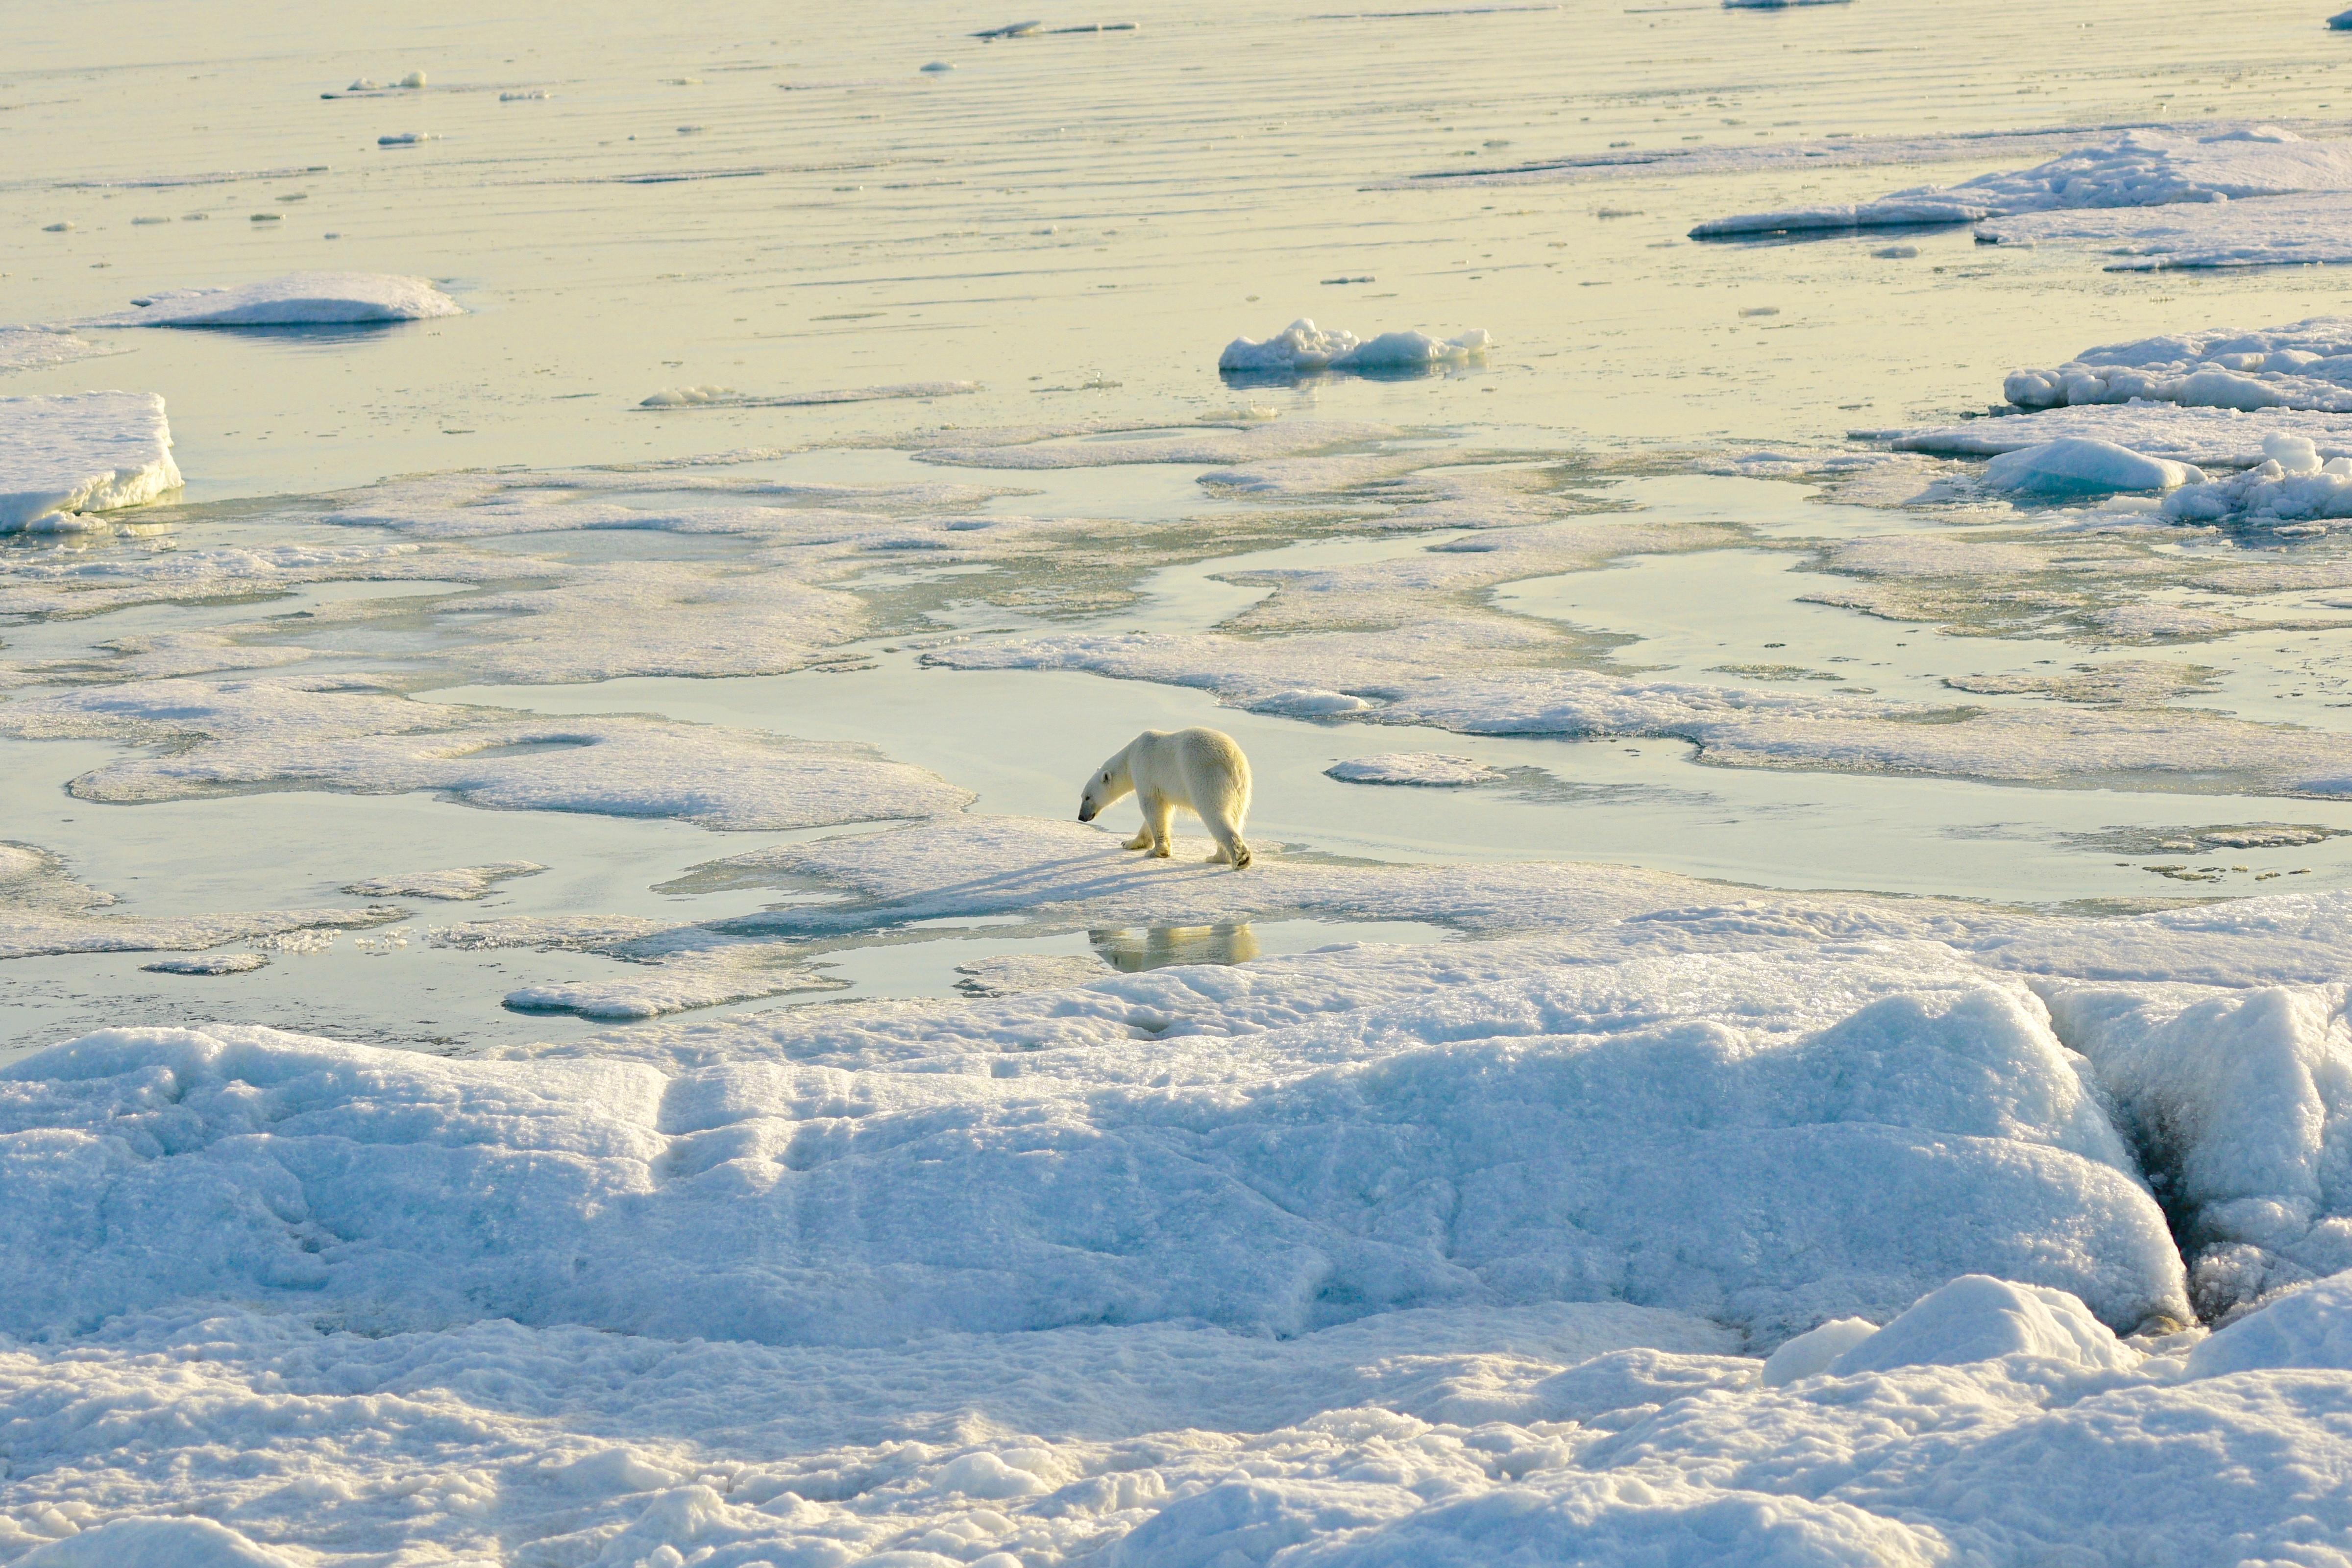 Pack ice, Svalbard 2015